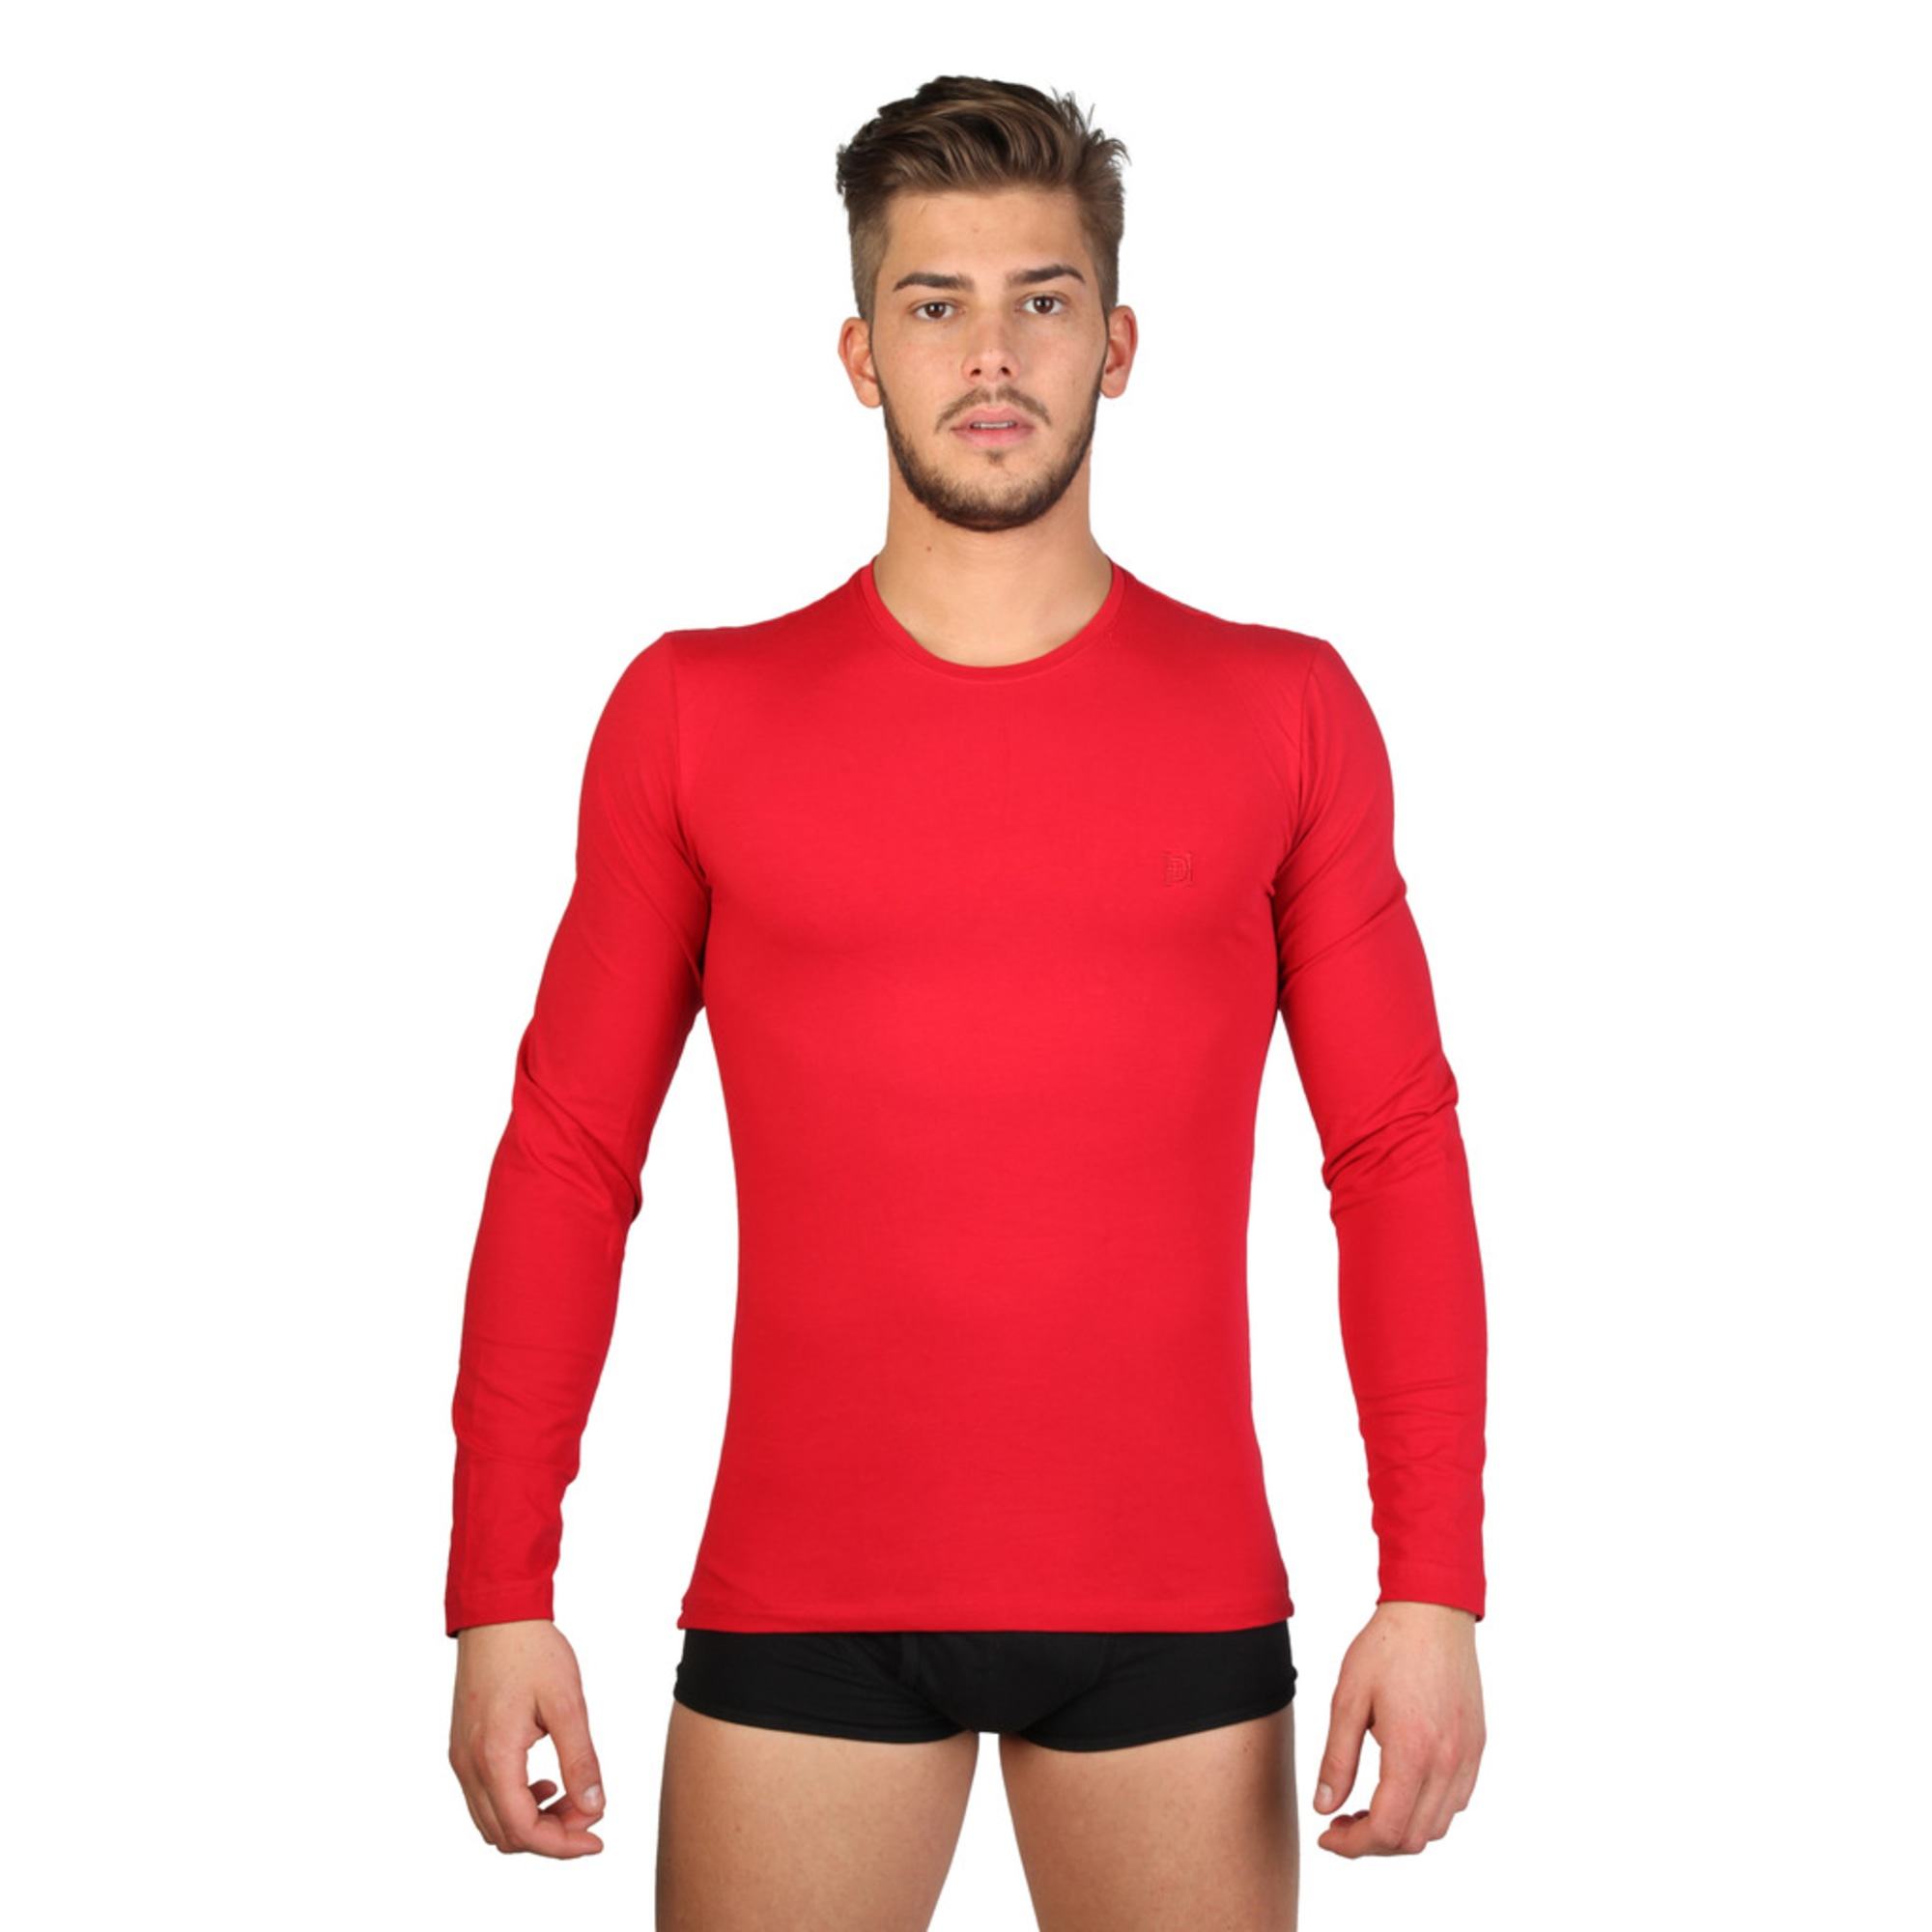 T-shirt DATCH Red, burgundy